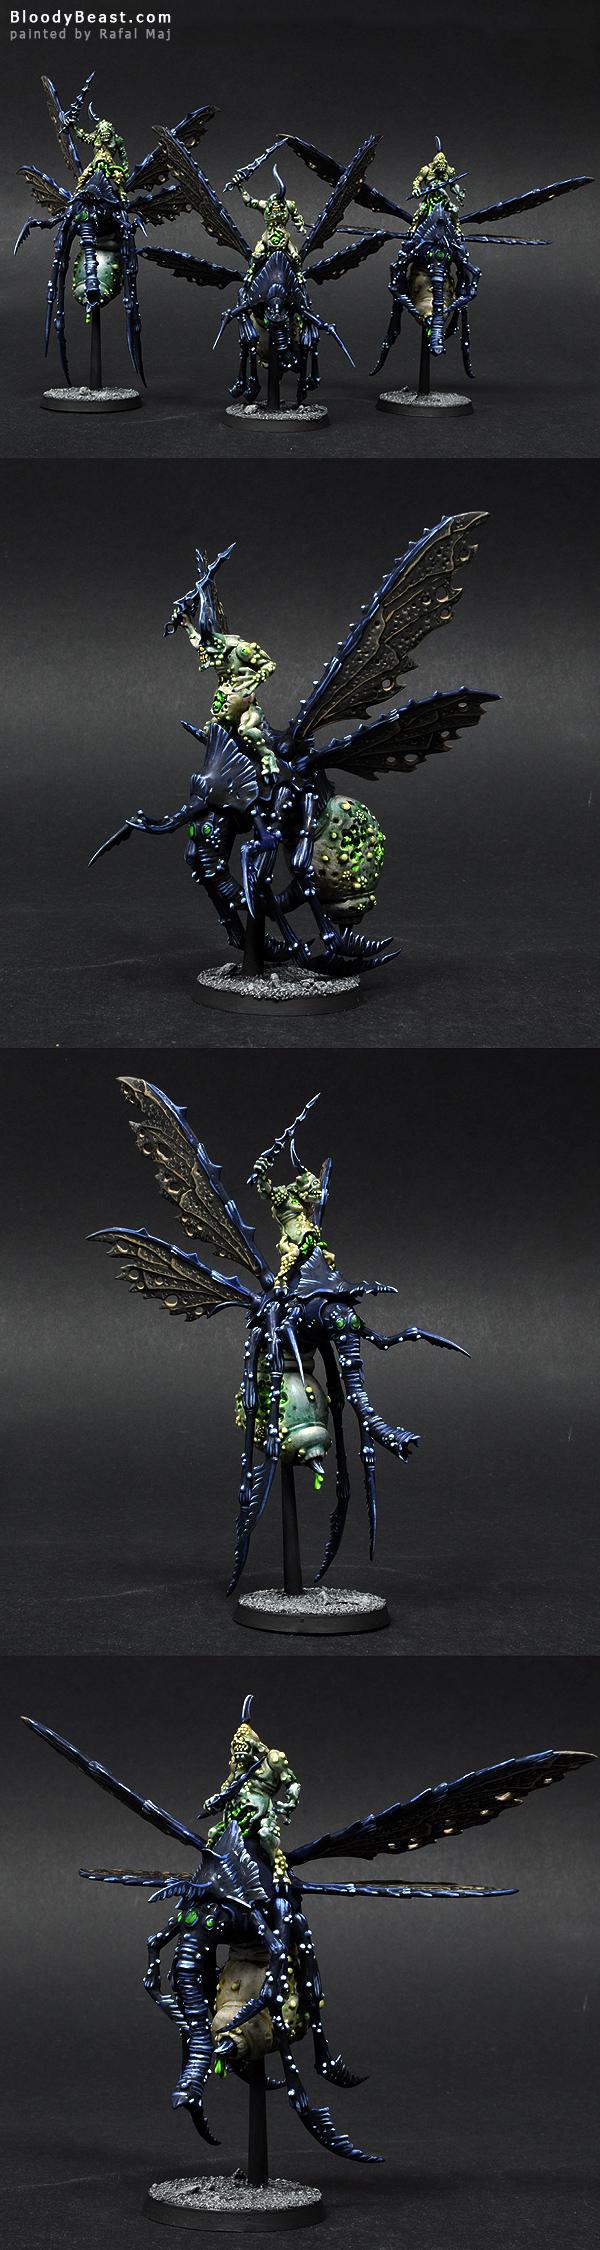 Plague Drones of Nurgle painted by Rafal Maj (BloodyBeast.com)